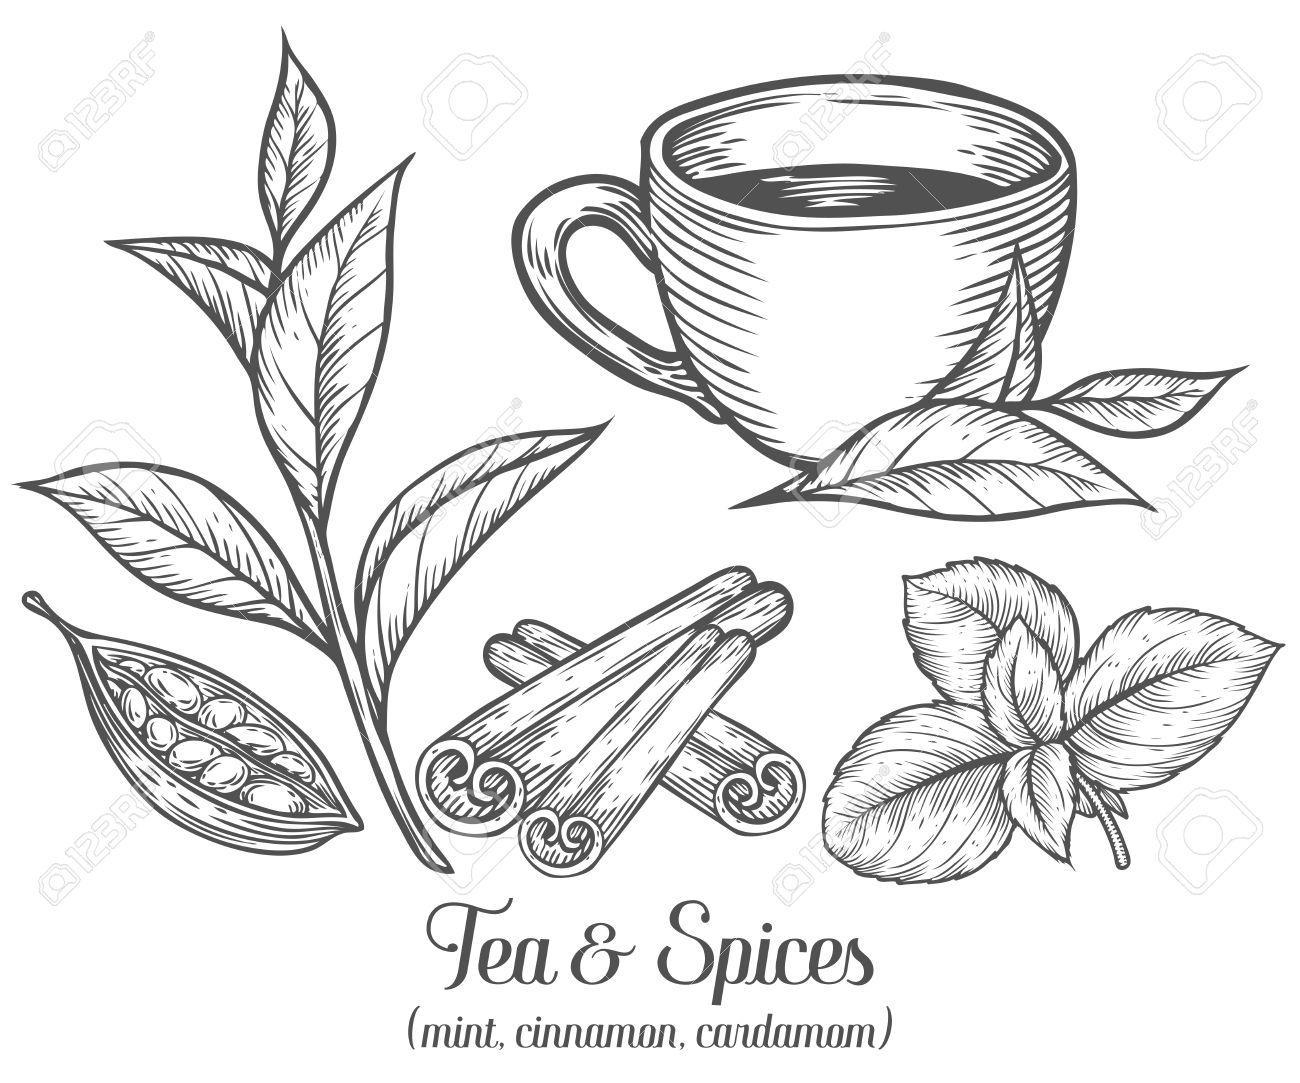 1300x1083 Green Black Herbal Tea Plant, Leaf With Spices Cardamom, Cinnamon